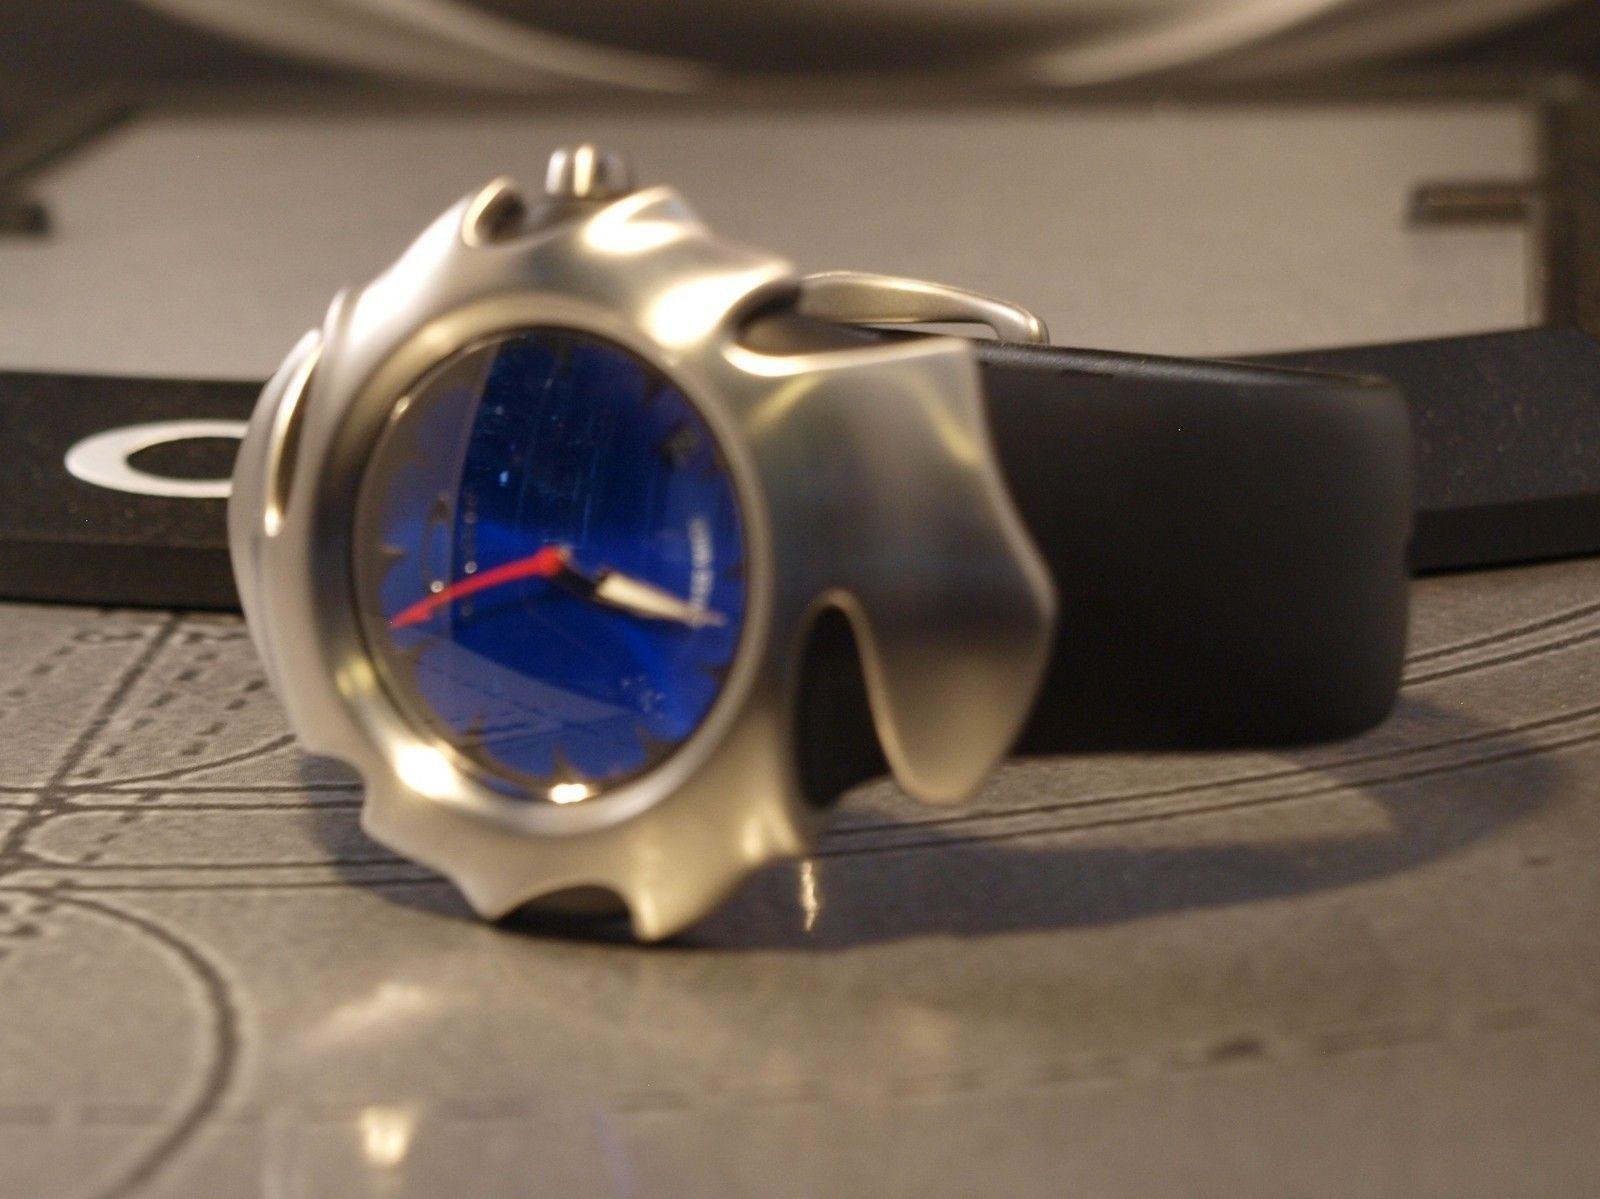 FS: Blade II  Brushed Sunburst Blue - 032ov.jpg